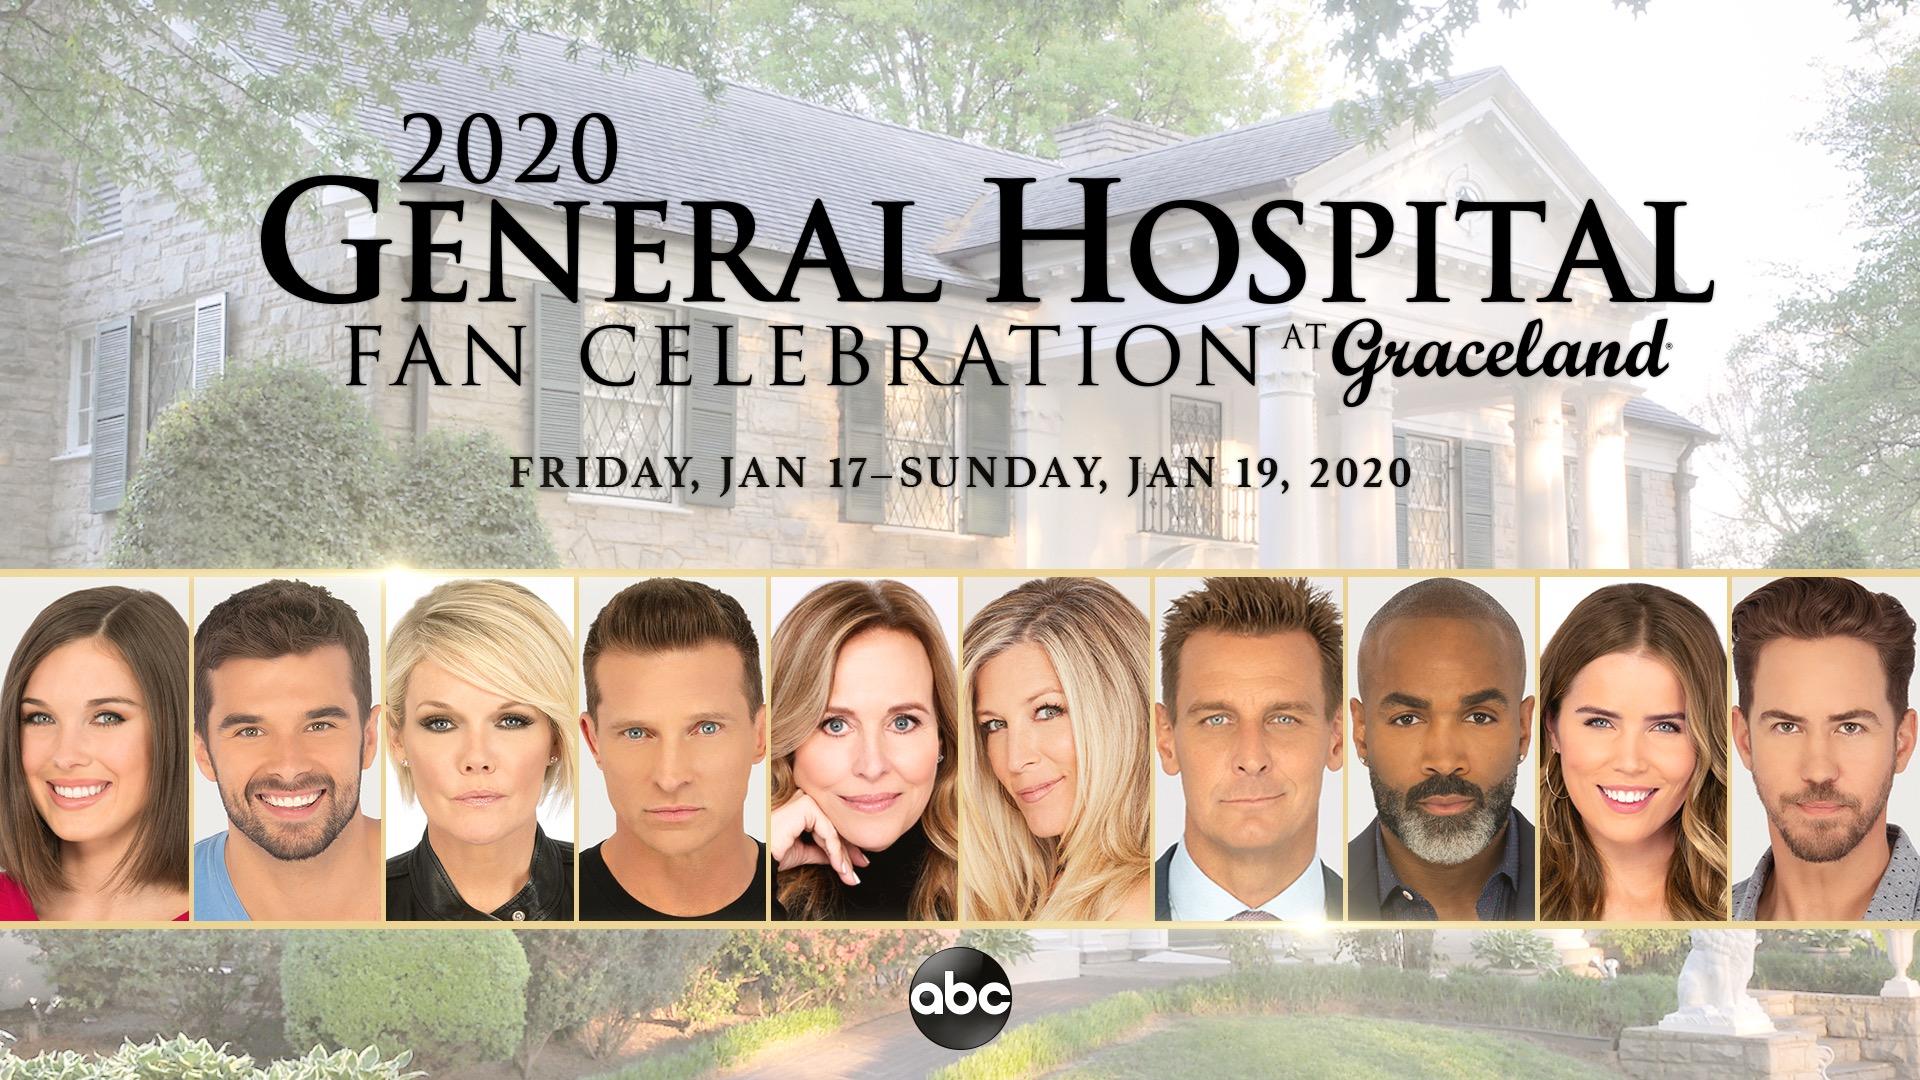 Cast of general hospital 2020